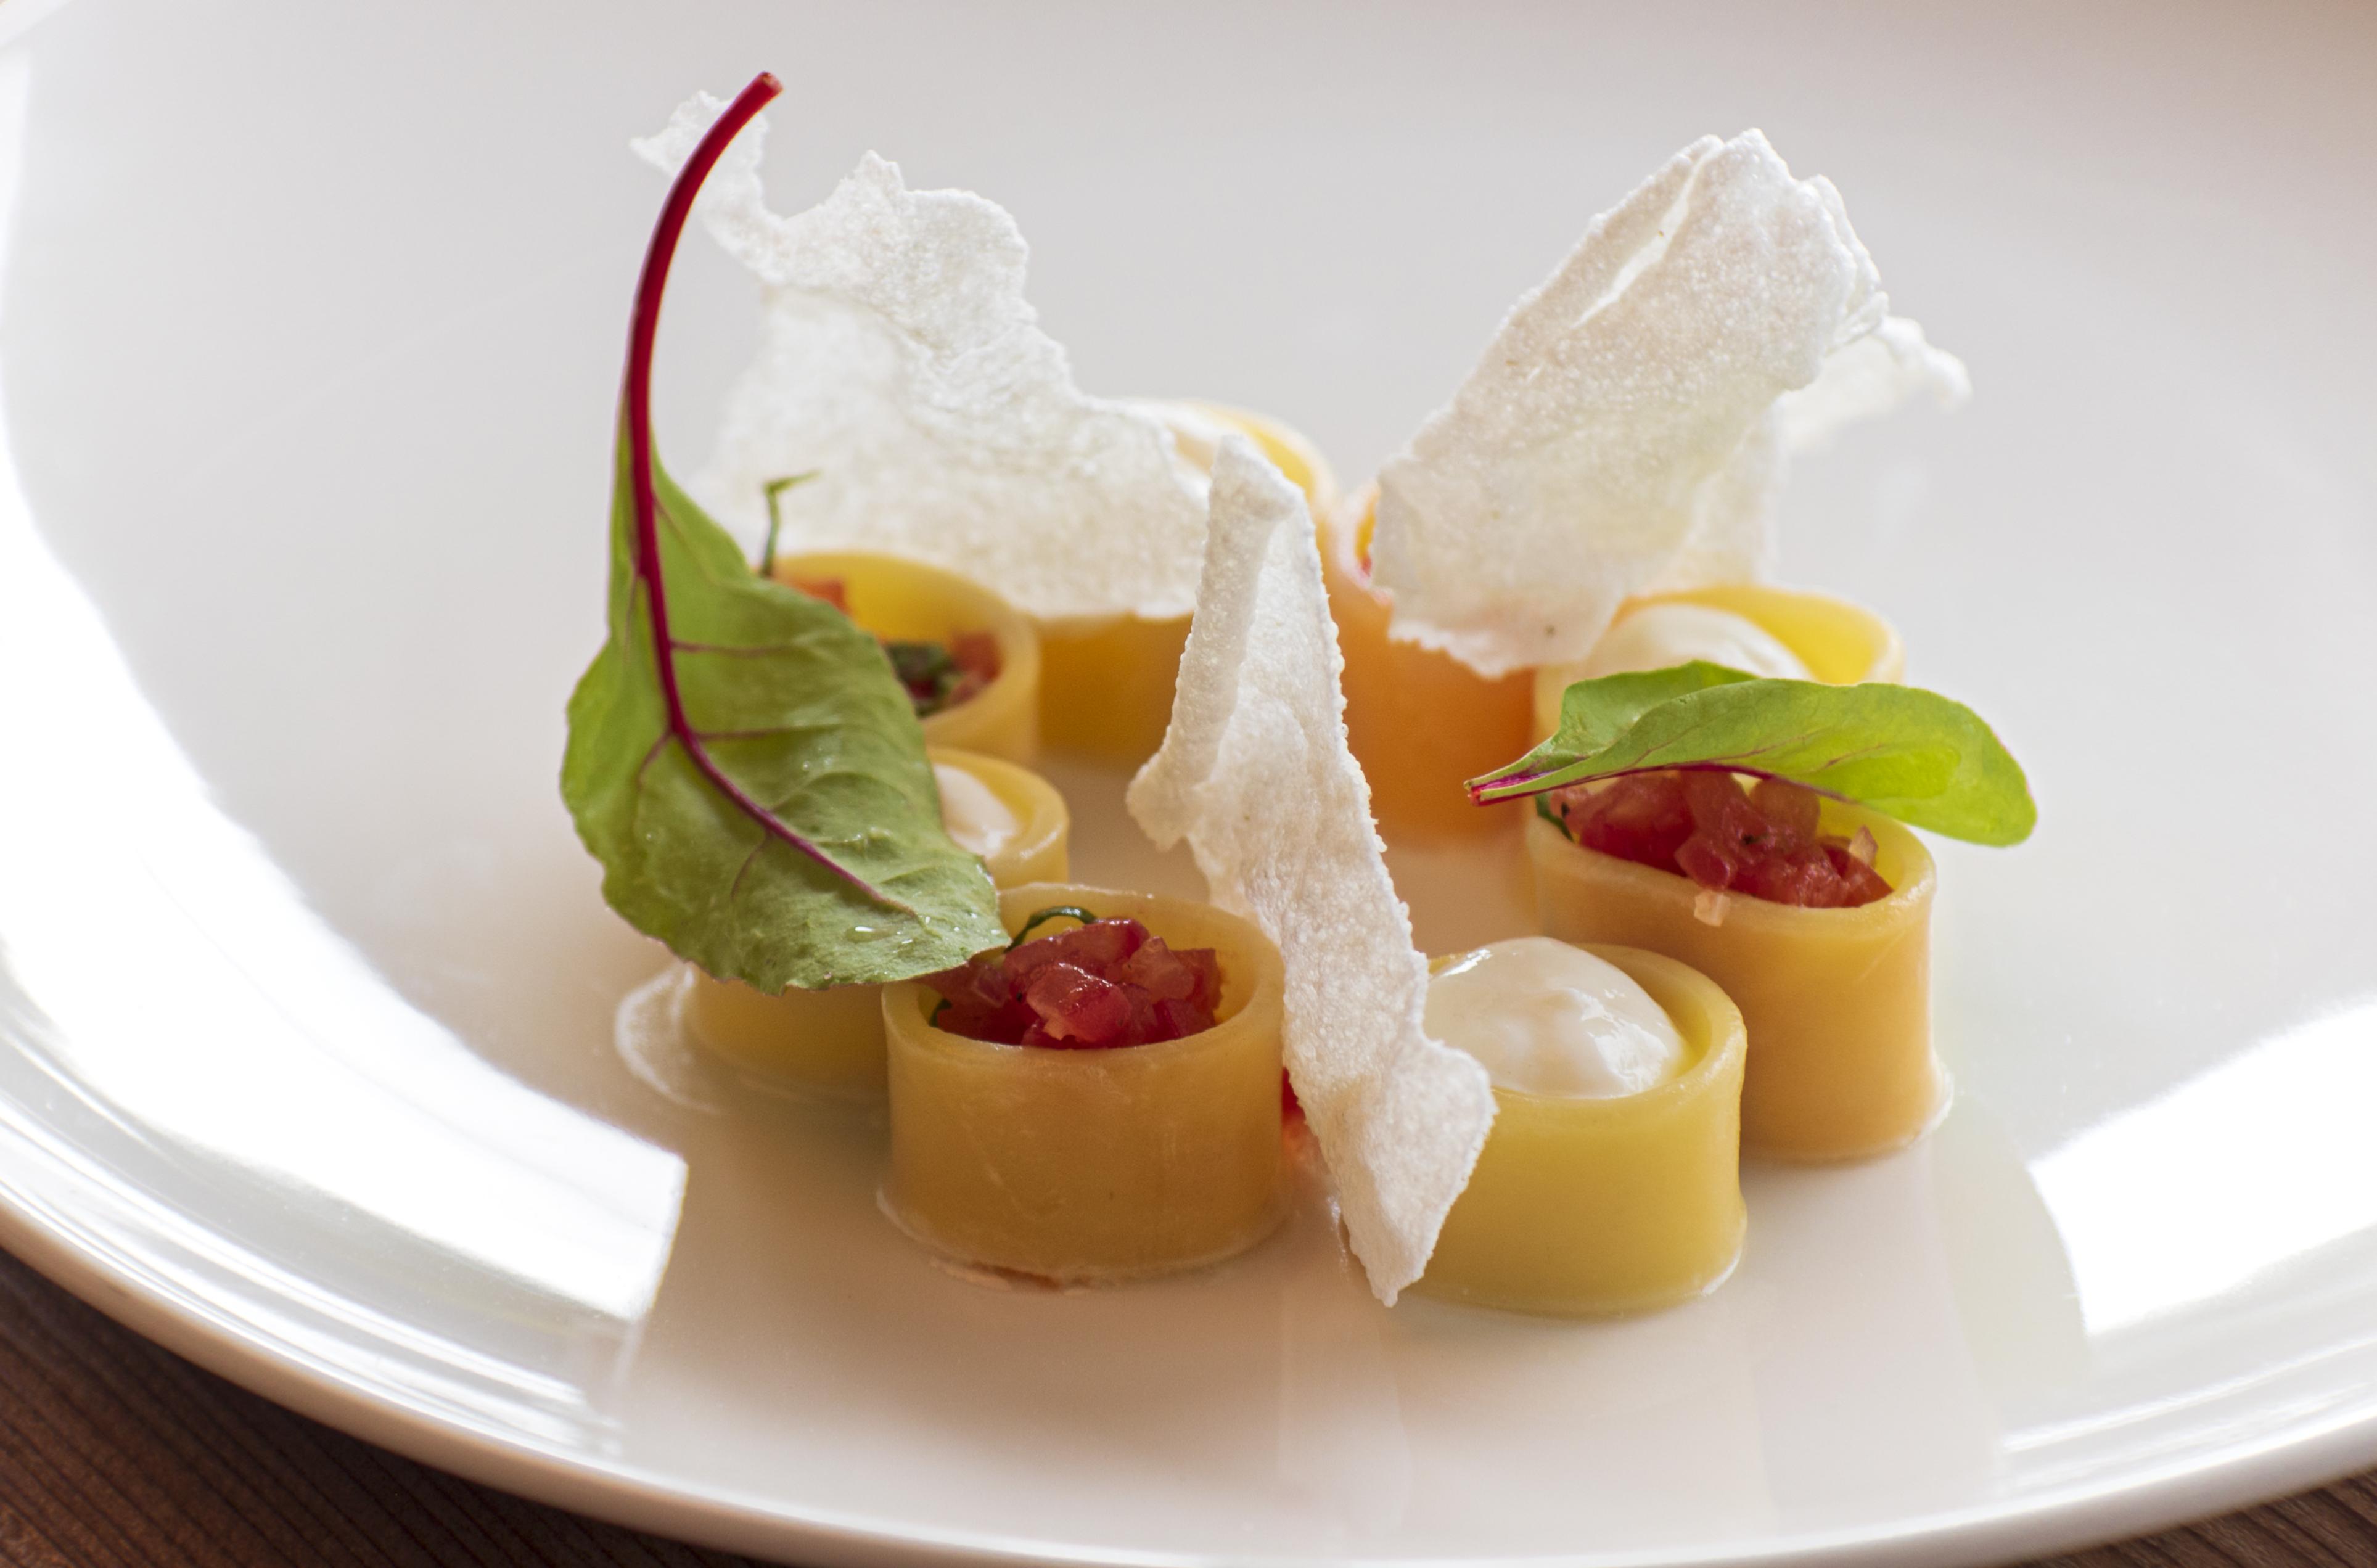 Calamarata tészta, ricotta* hab, citrusos paradicsom salsa